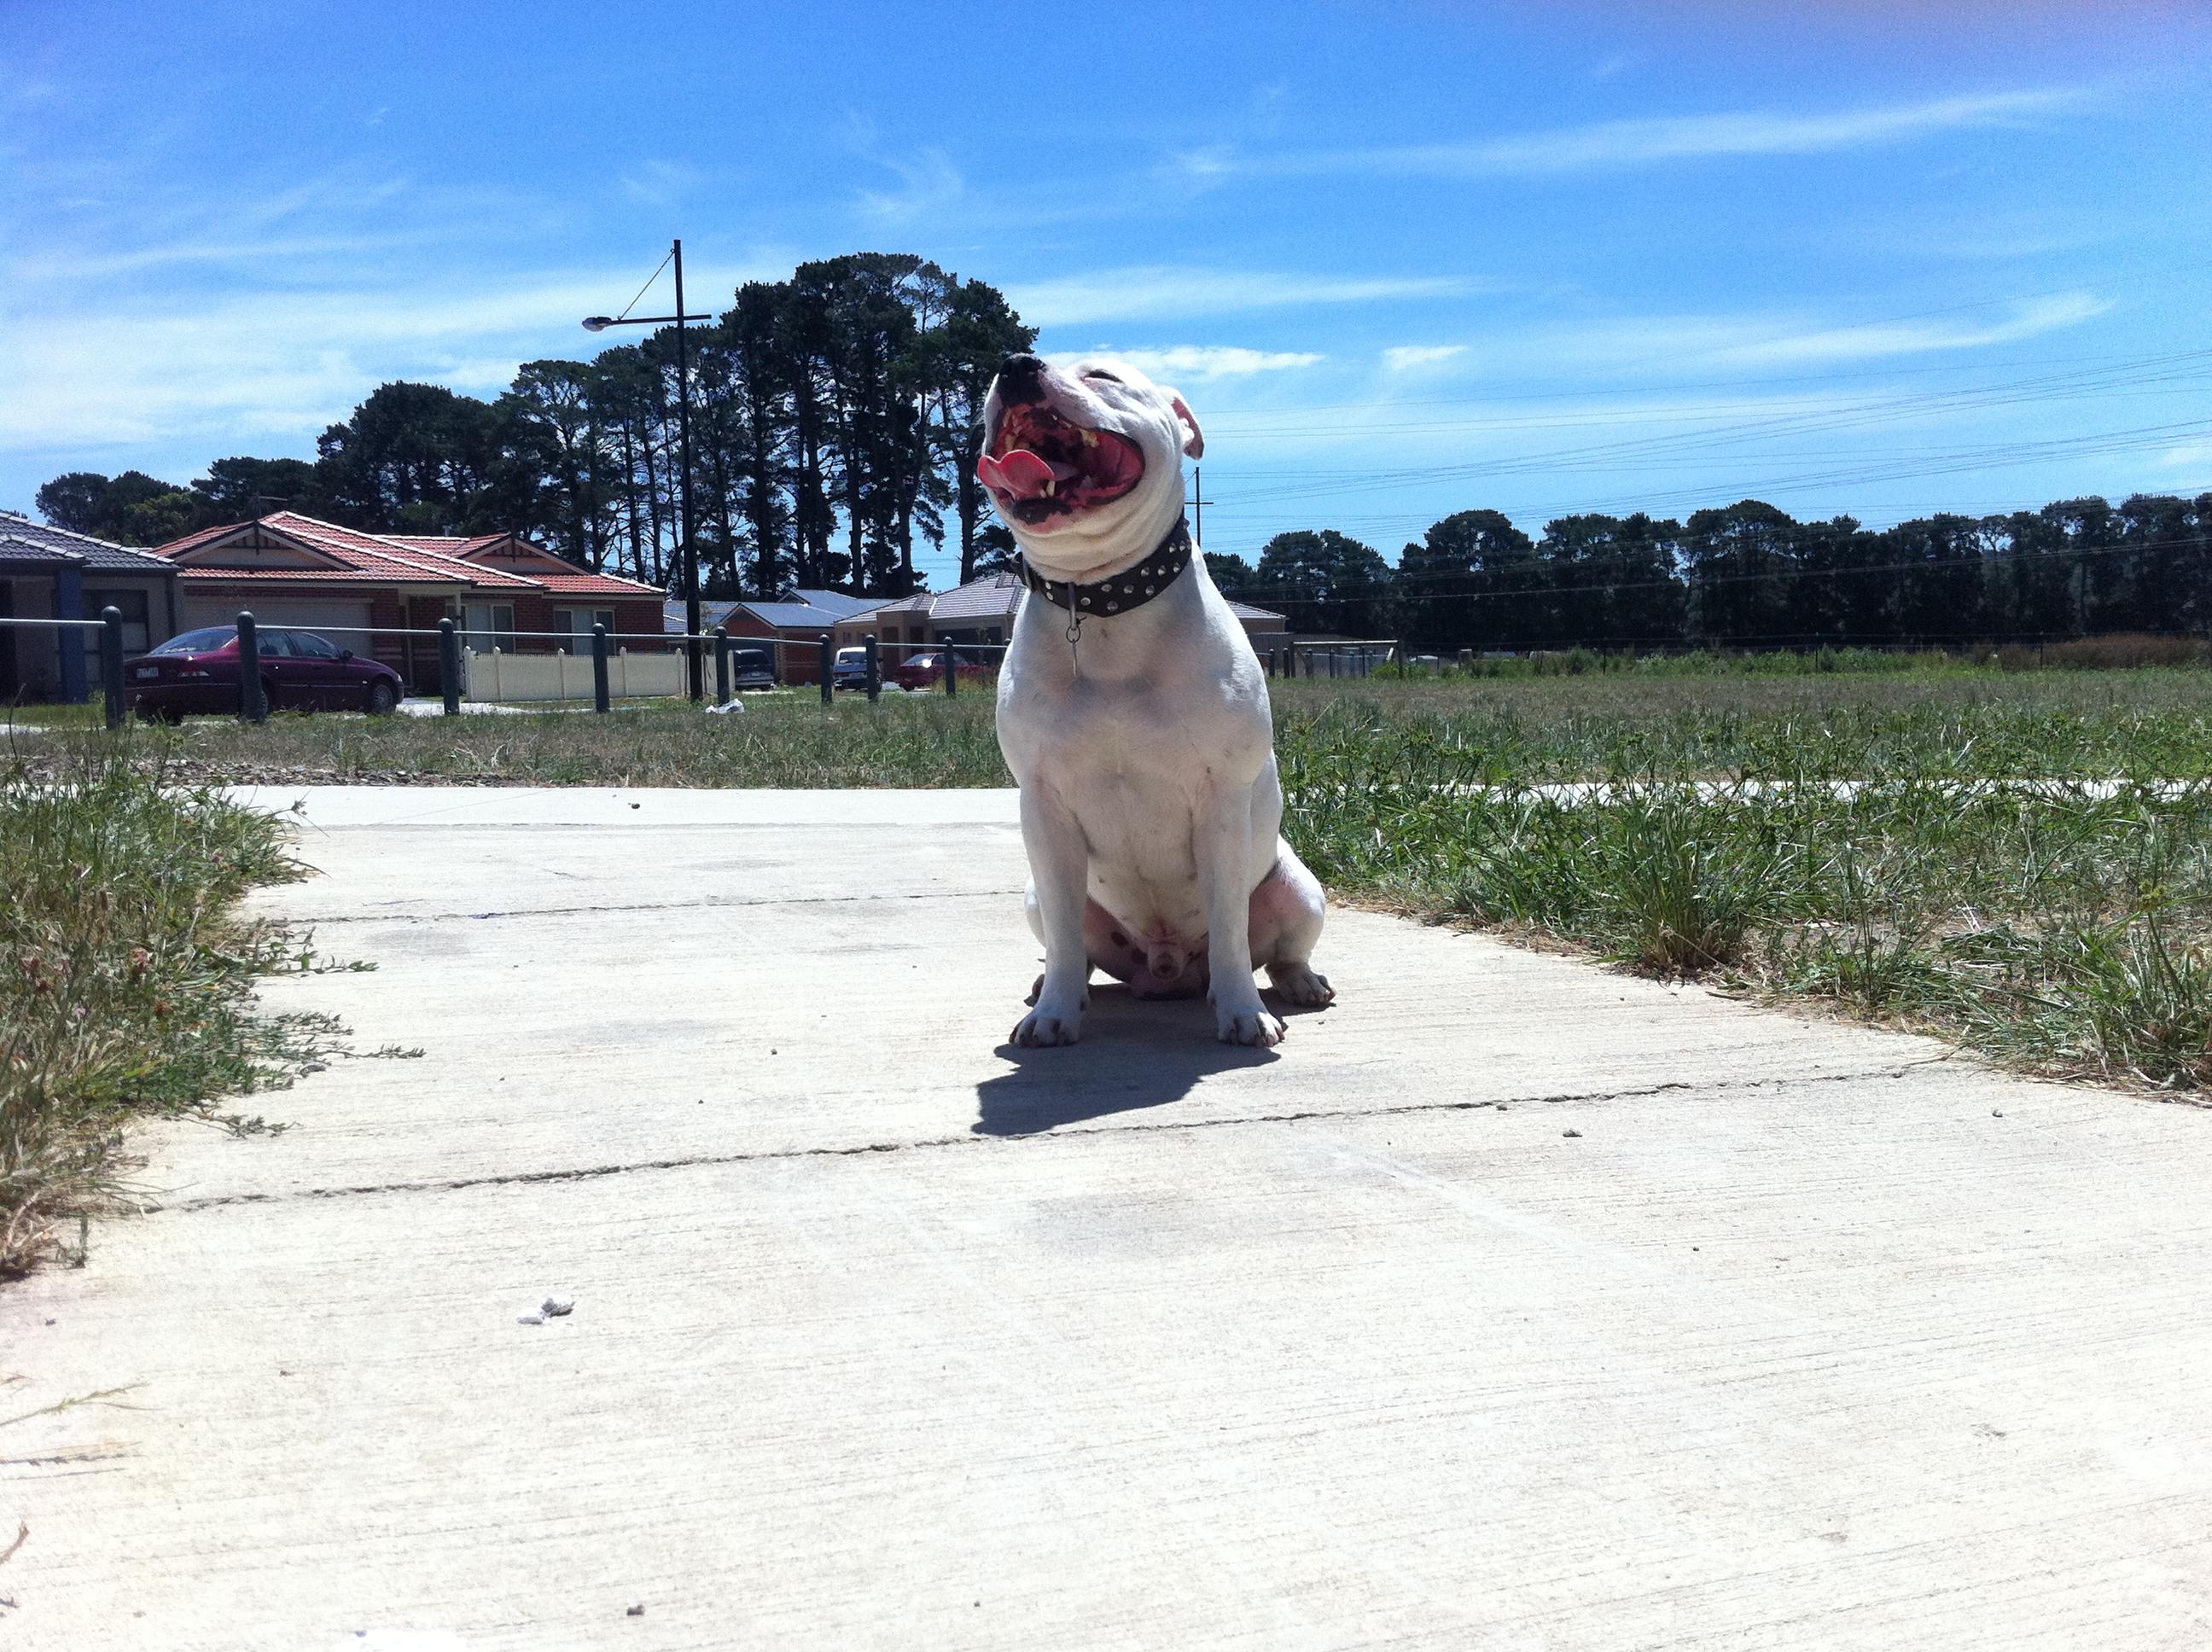 http://upload.wikimedia.org/wikipedia/commons/6/69/Staffordshire_Bull_Terrier.jpg